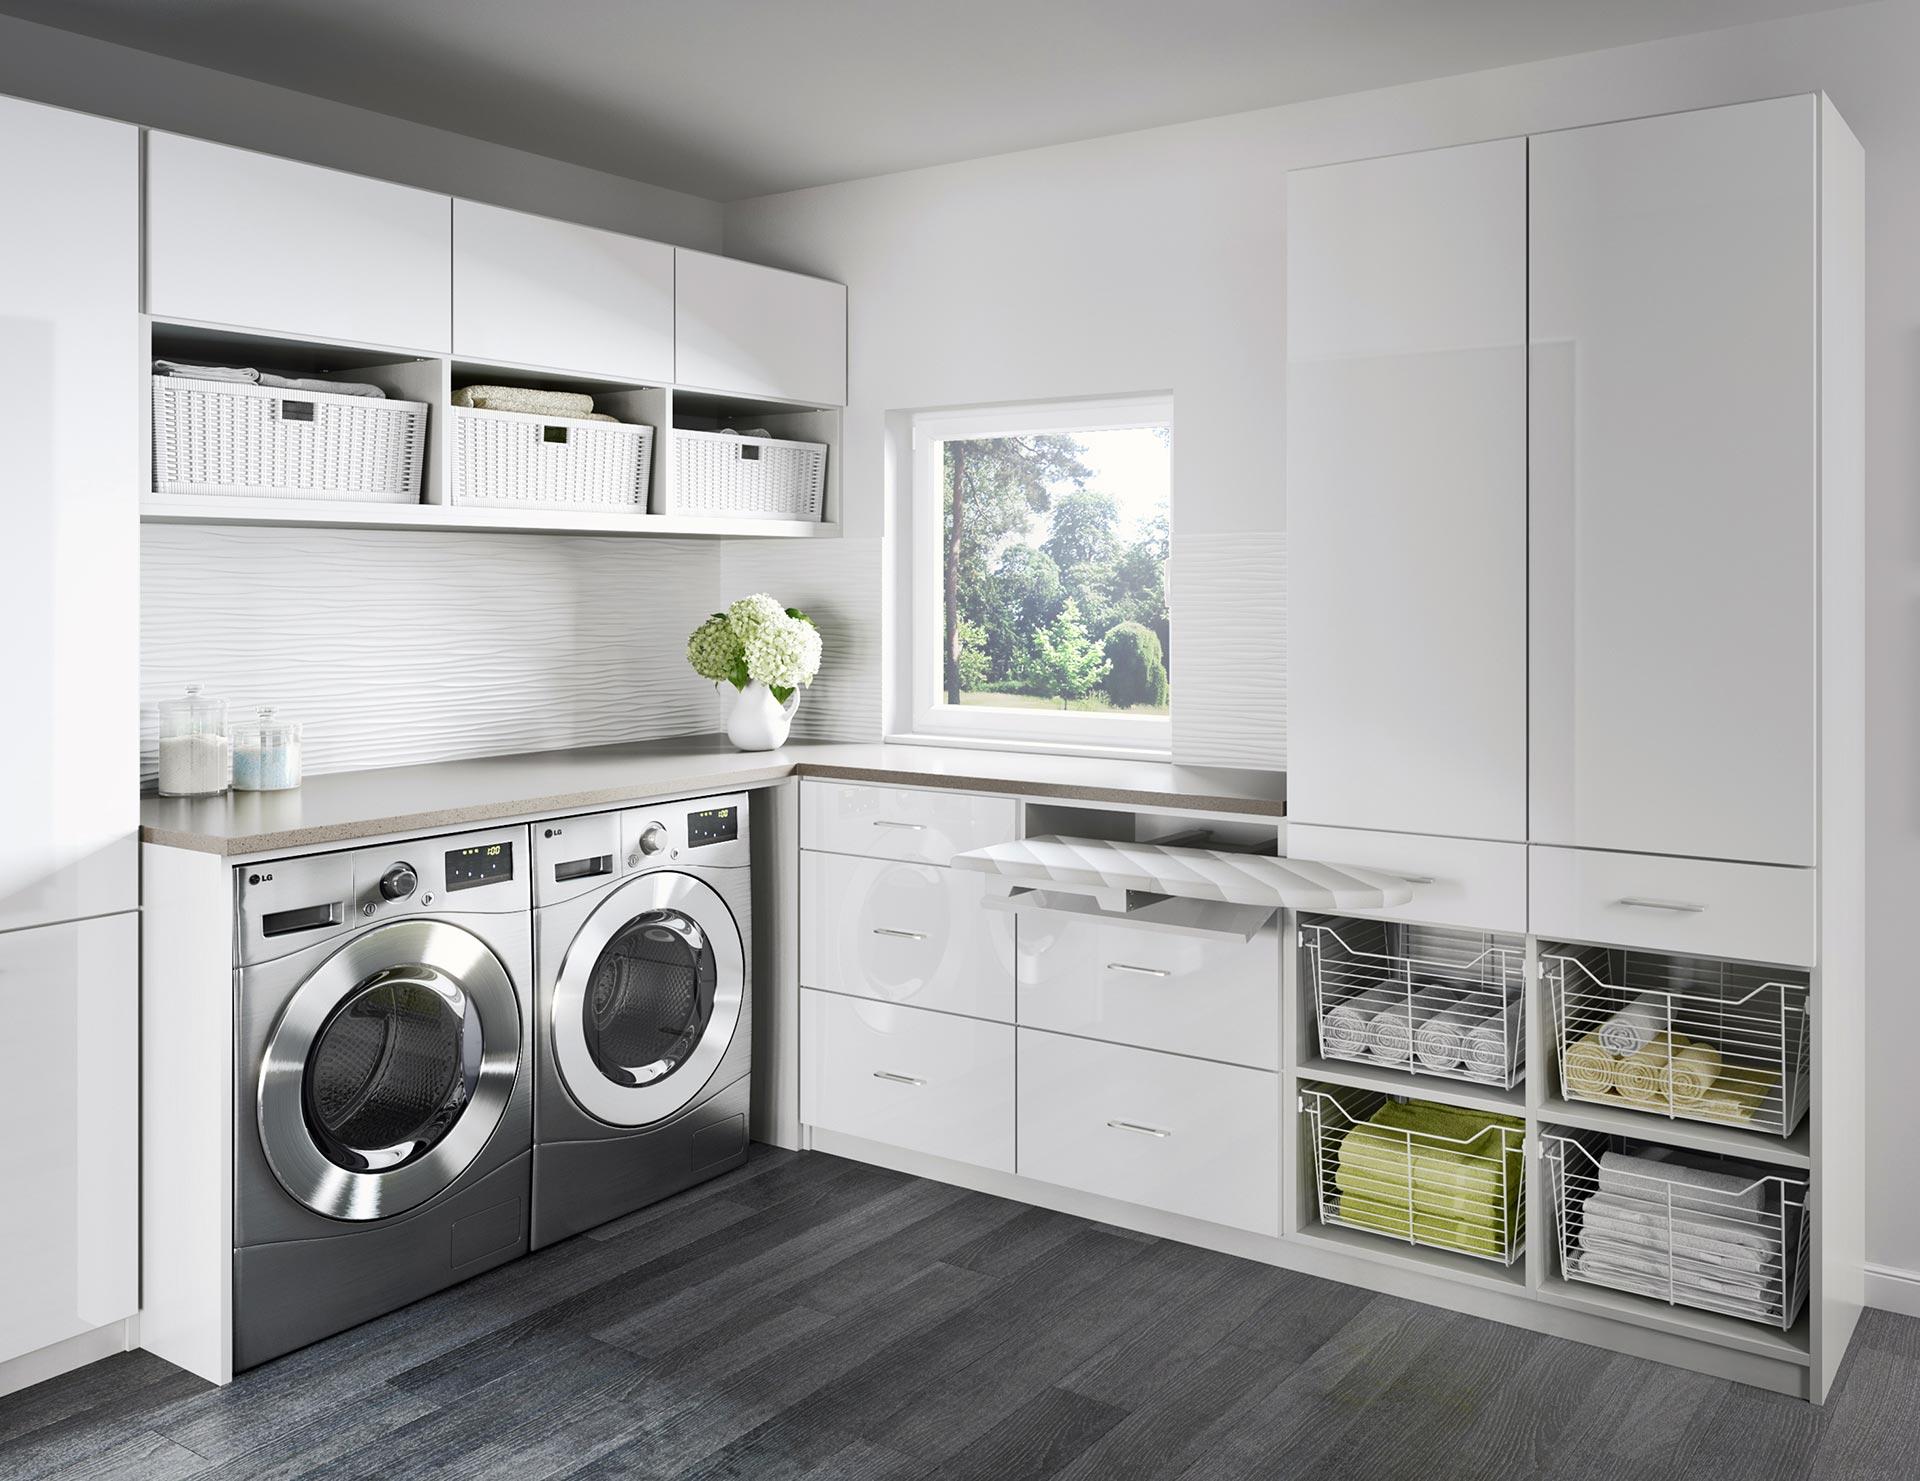 Laundry Room Cabinets & Storage Ideas | California Closets on Laundry Room Cabinet Ideas  id=31765